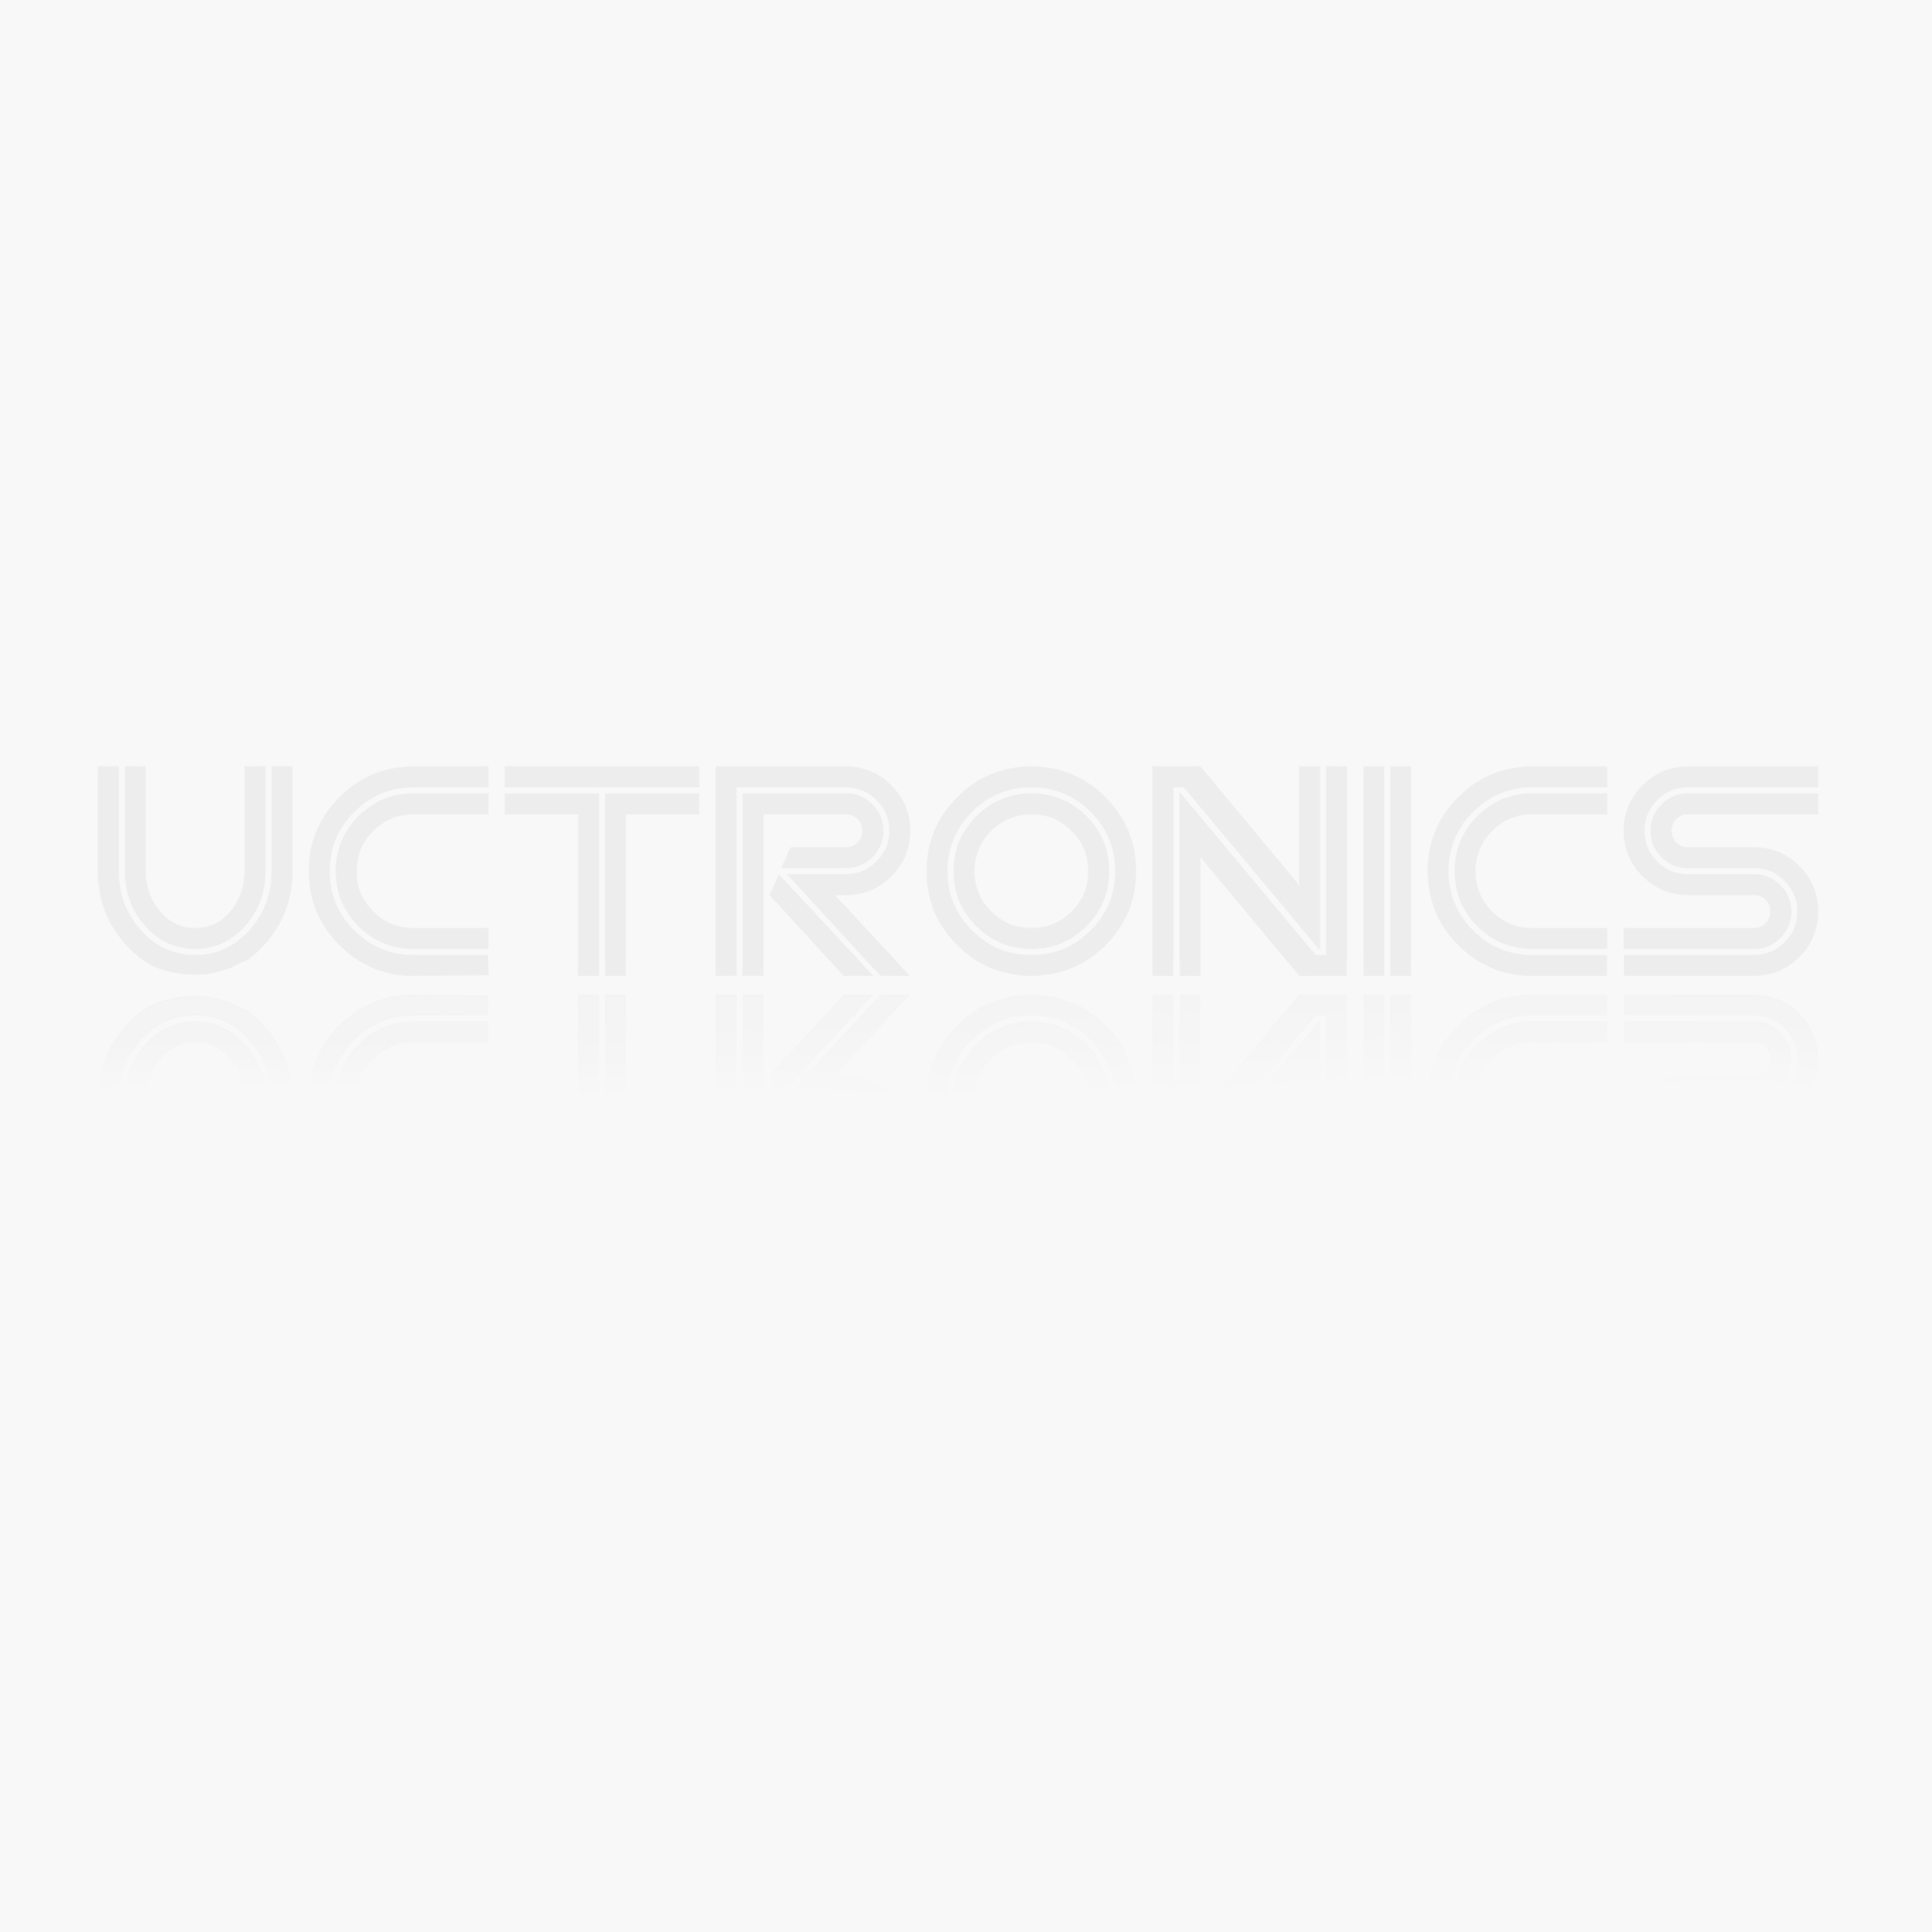 Arducam 8MP Synchronized Stereo Camera Bundle Kit for Raspberry Pi